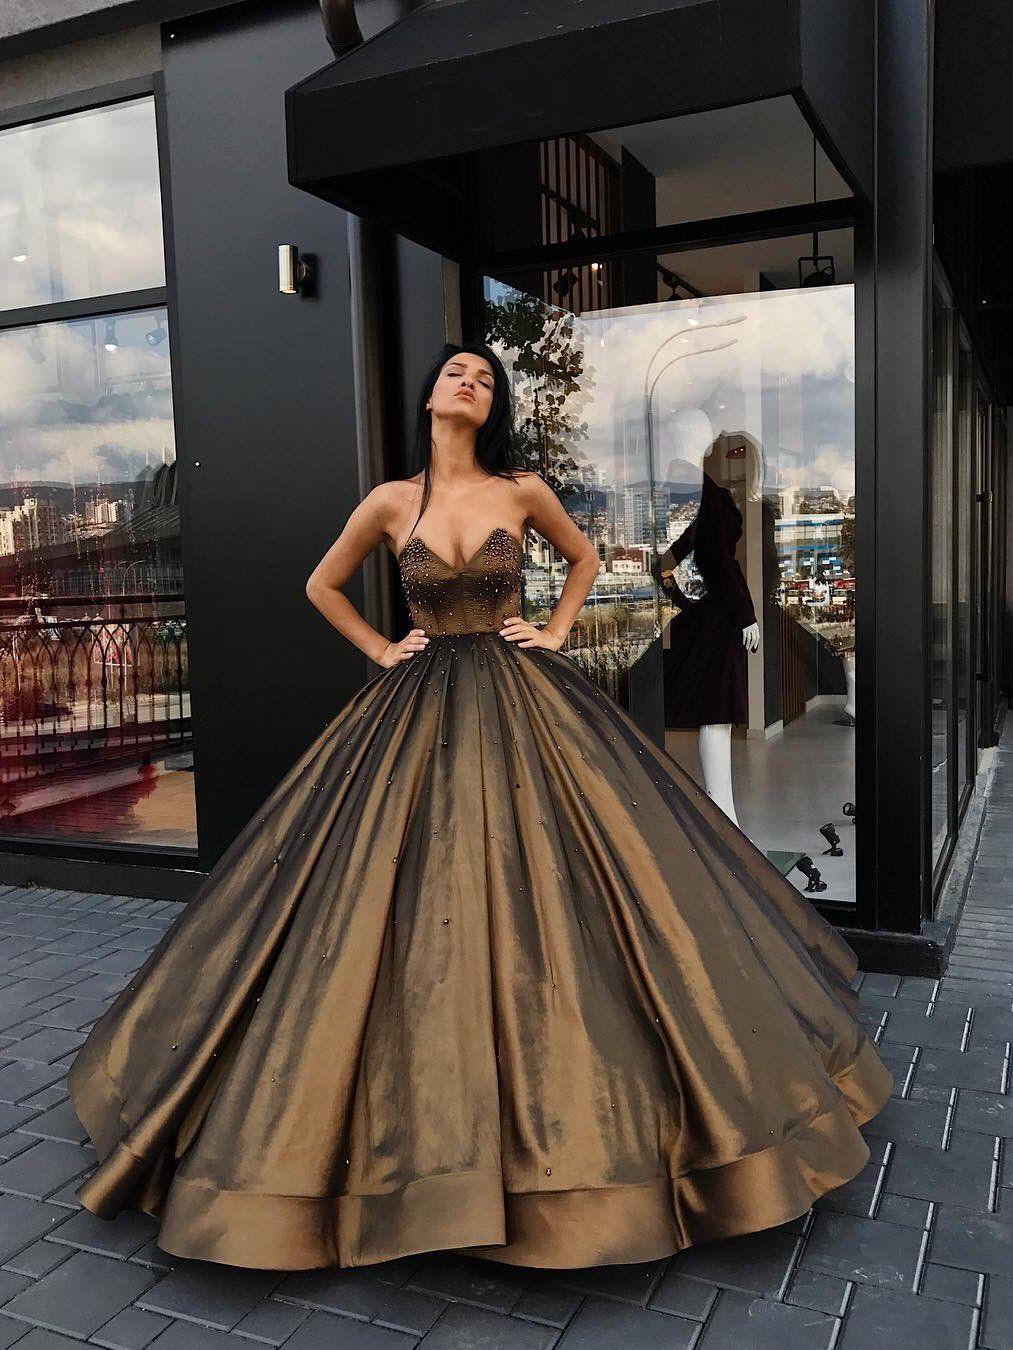 Ball Gown Prom Dresses Sweetheart Floor-length Brown Long Prom  Dress/Evening Dress JKL328